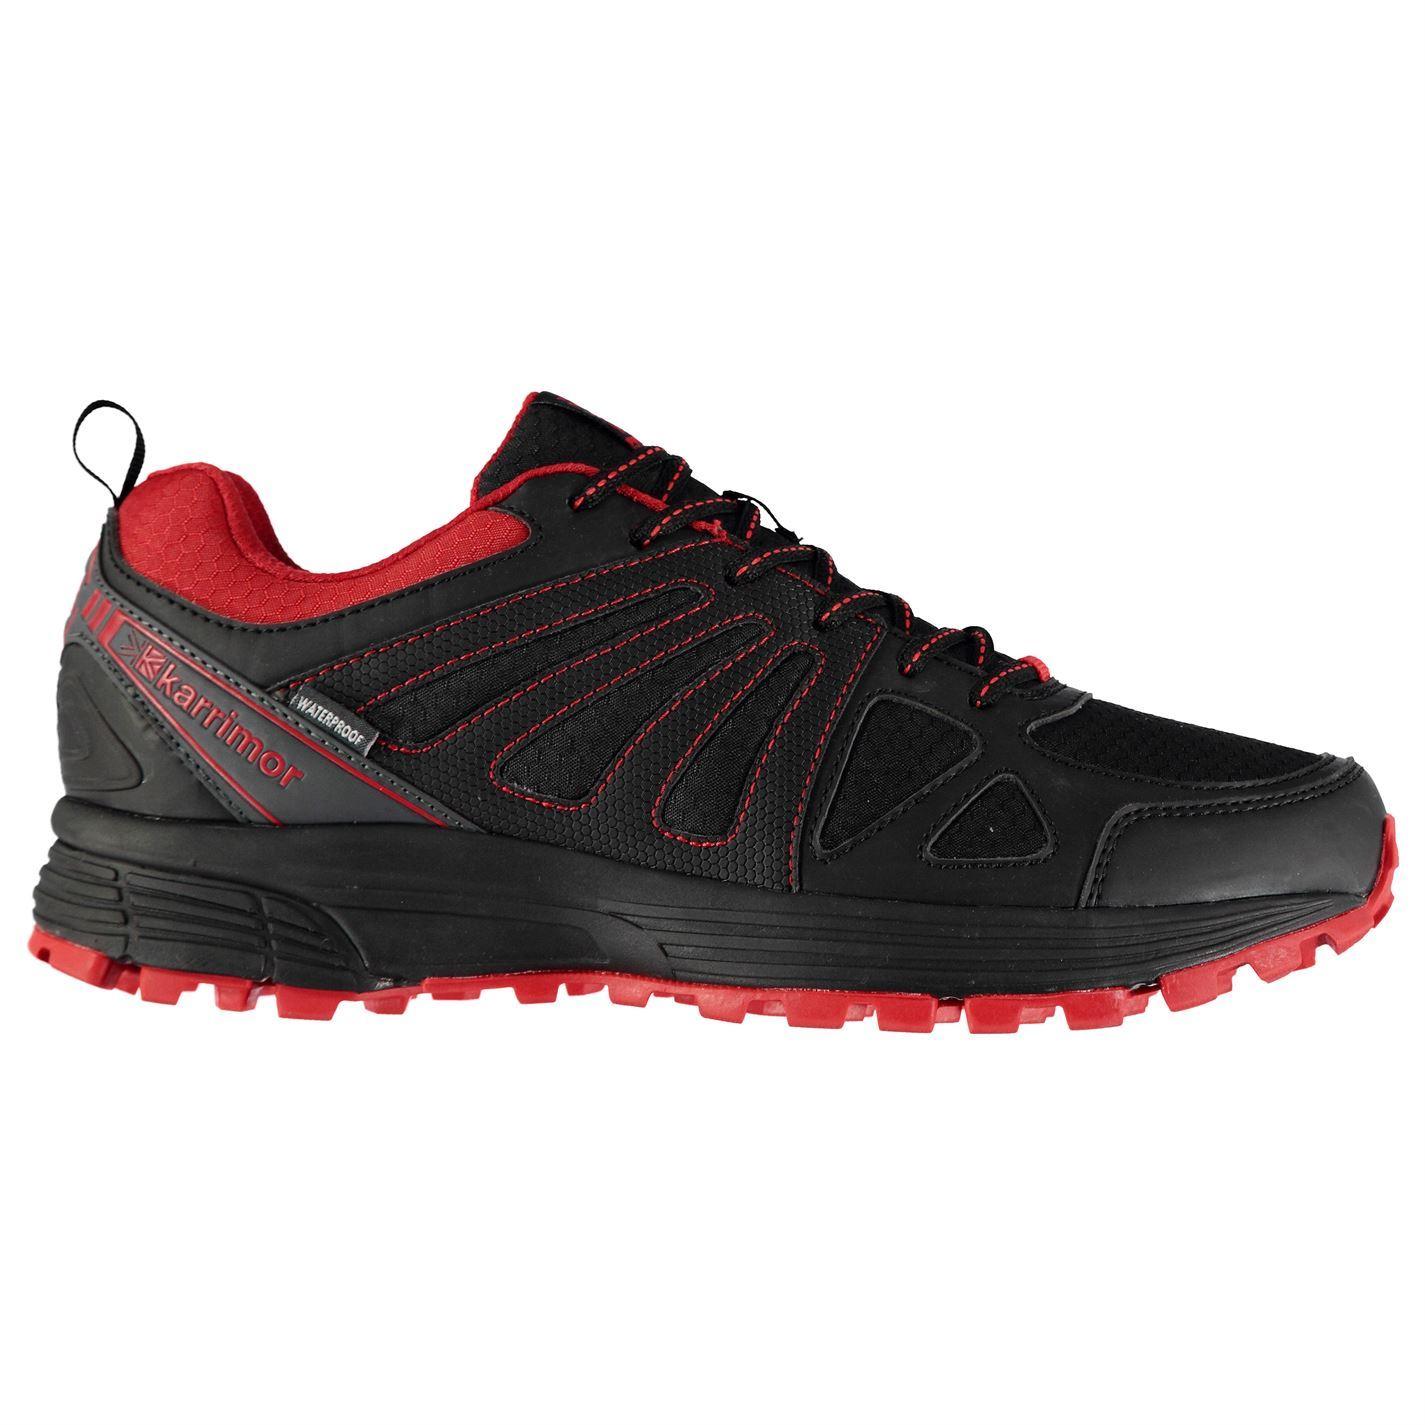 1SEP AQ5921 NEW Adidas Galaxy Trail Running CrossTrainer Shoes